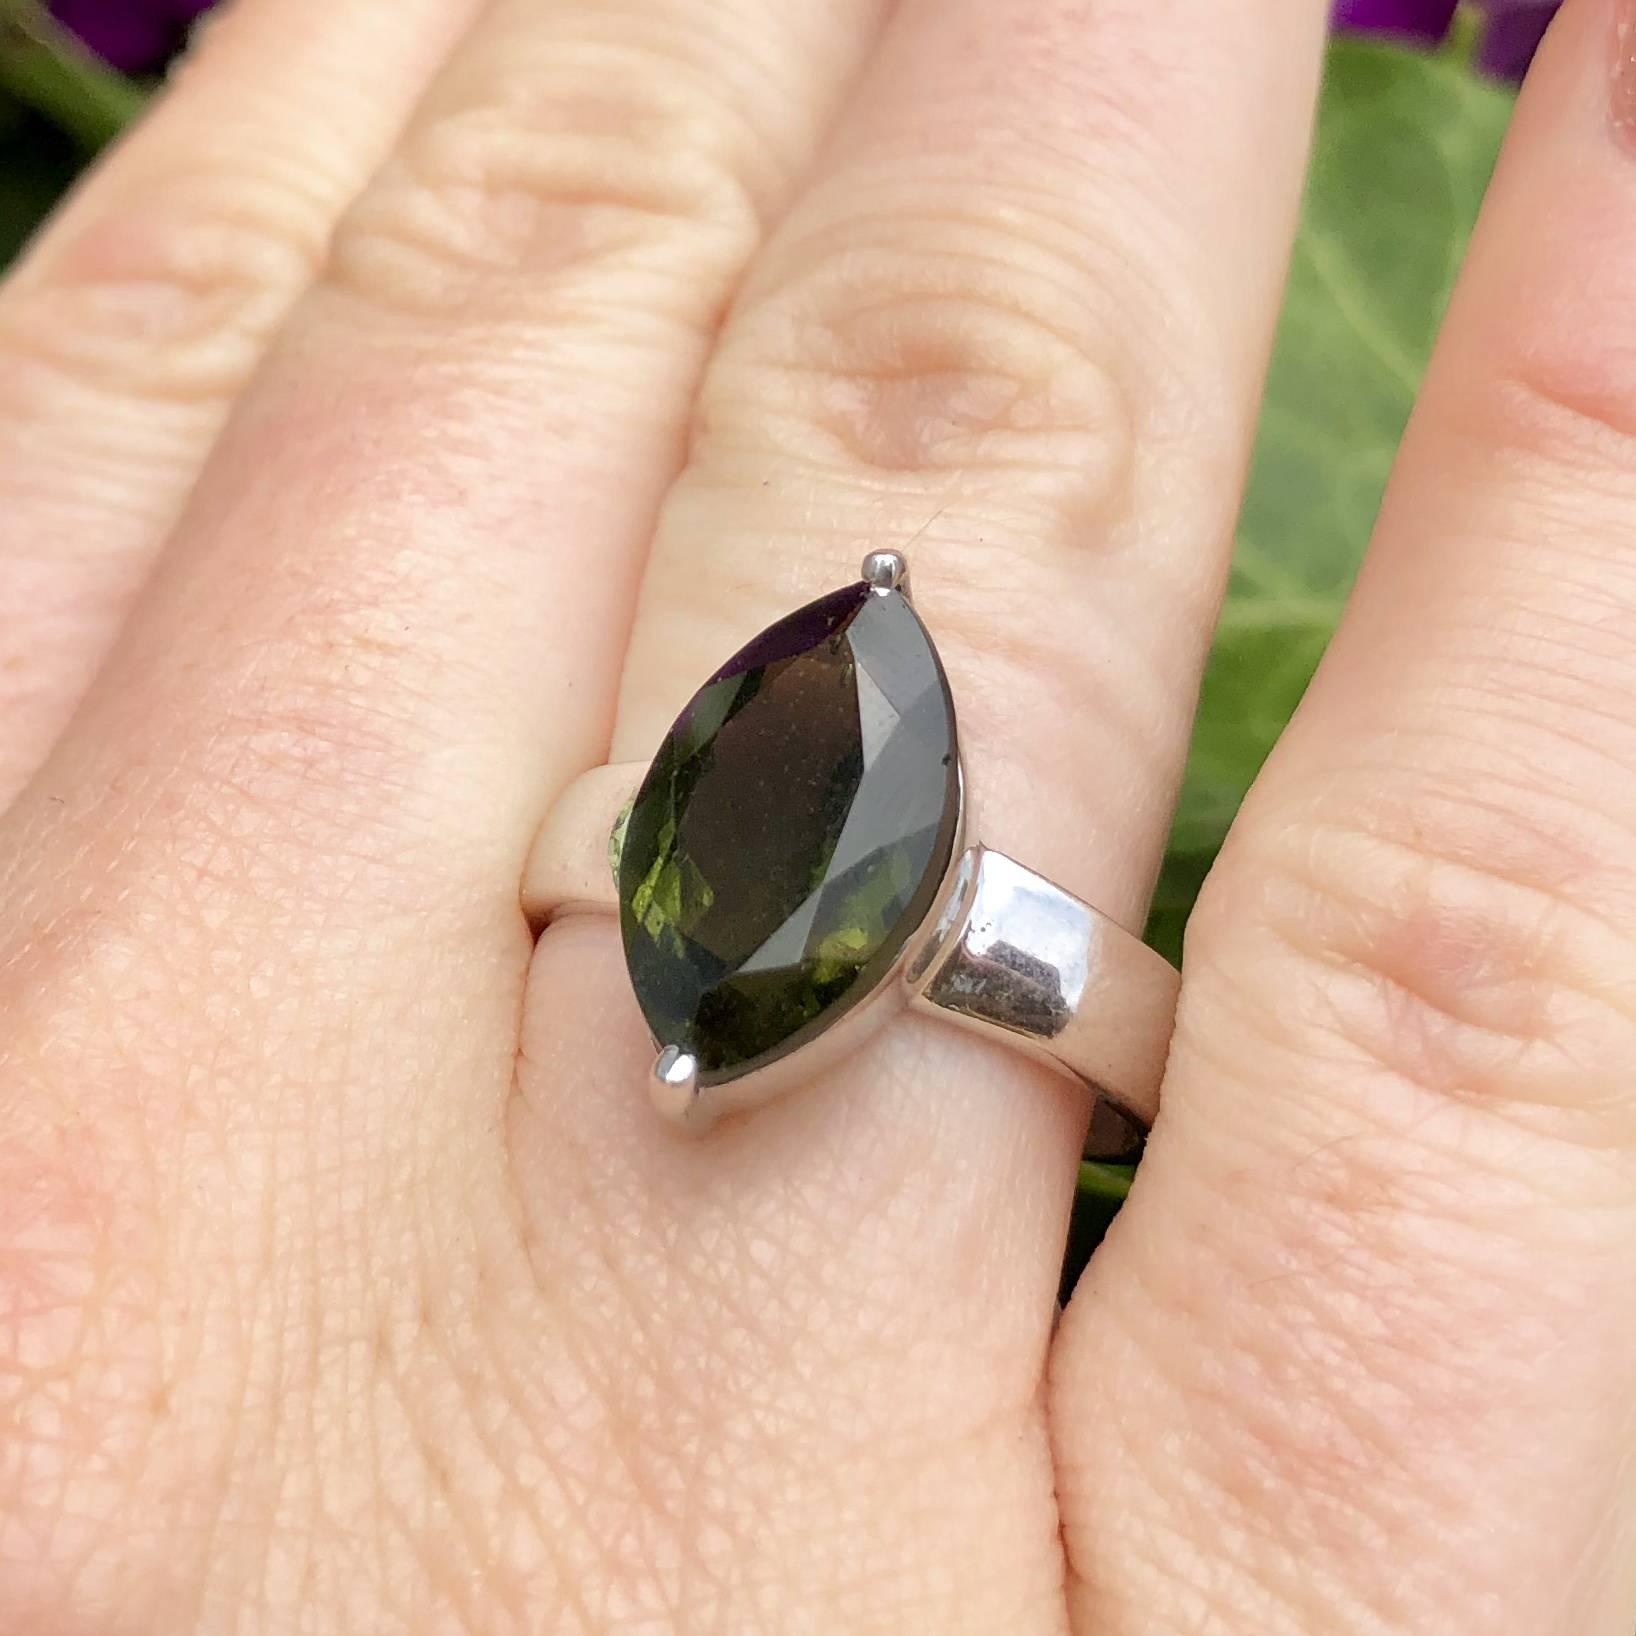 Gemstone Sale: Faceted Moldavite Ring Size 9